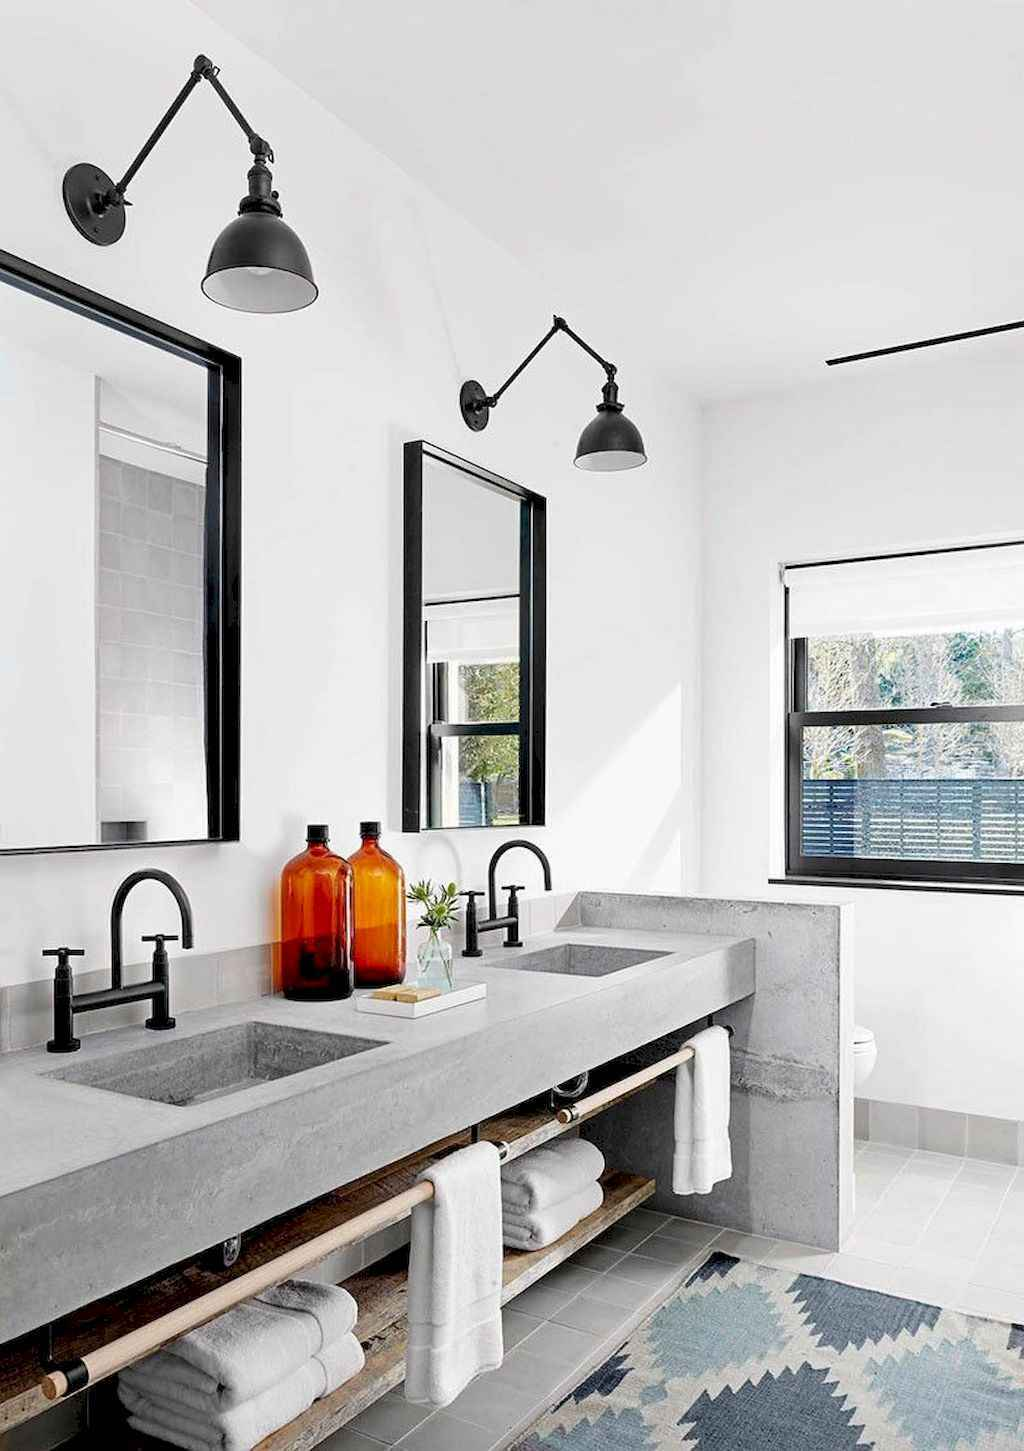 125 awesome farmhouse bathroom vanity remodel ideas (98)